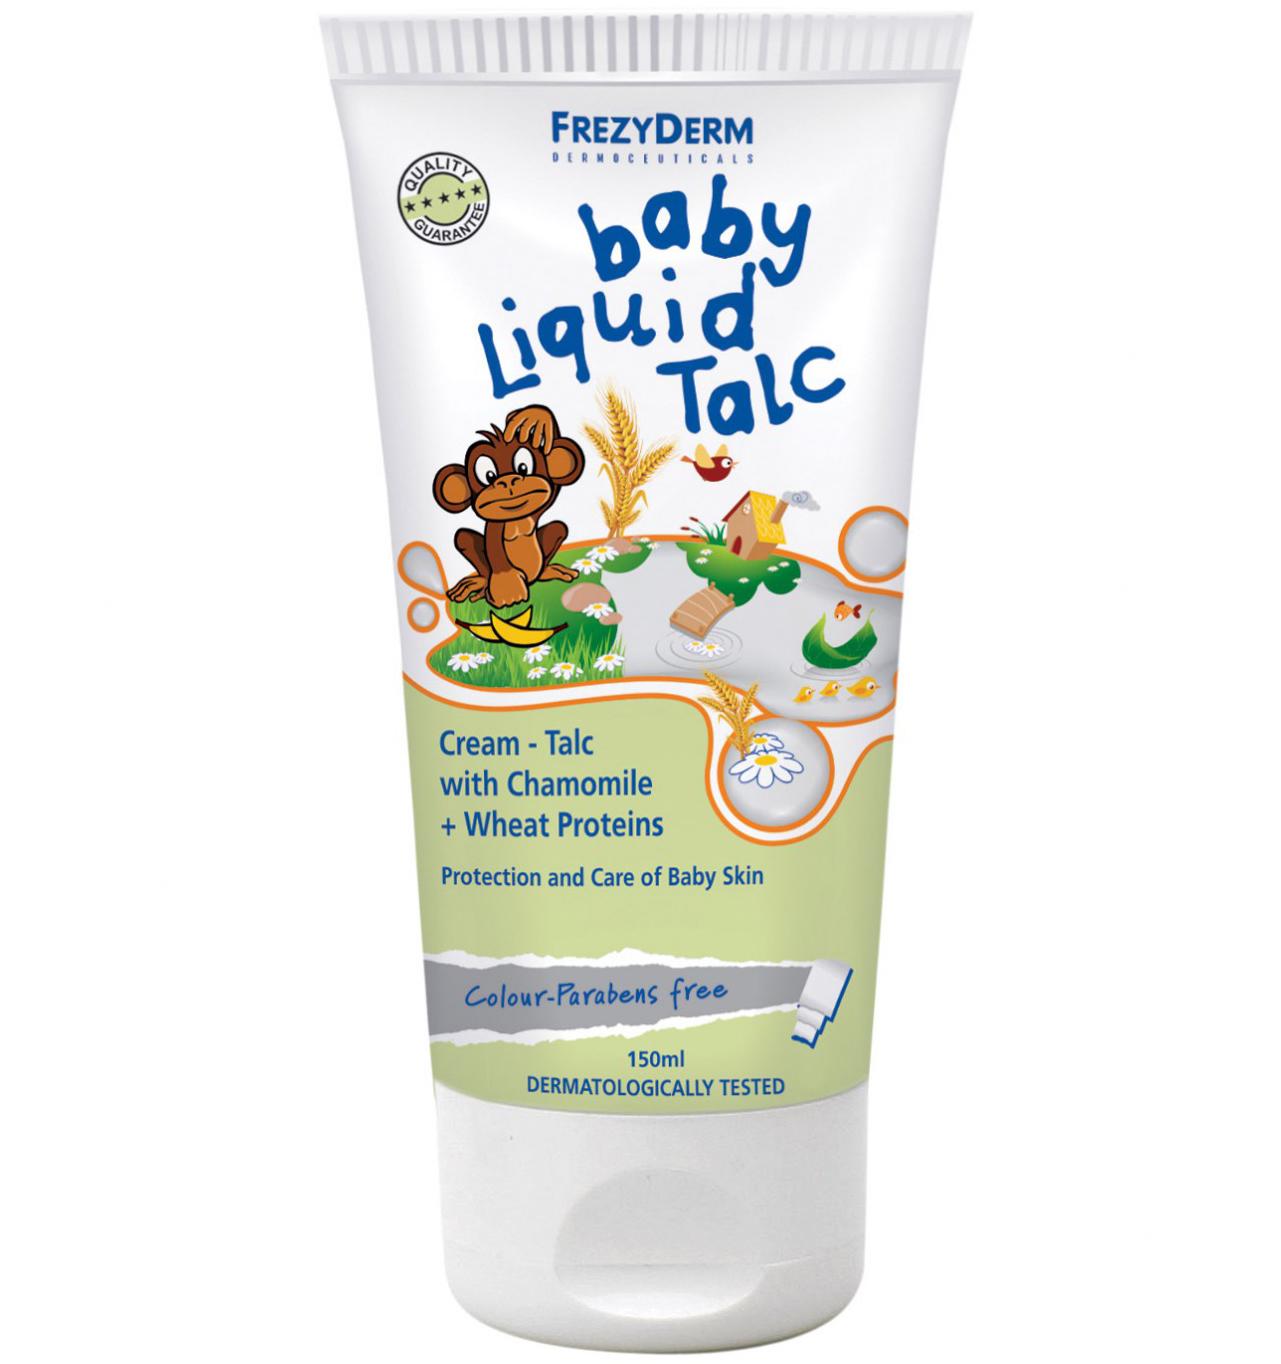 Frezyderm Baby Liquid Talc Κρέμα Talc για την Περιποίηση της Βρεφικής &Παιδικής Επιδερμίδας 150ml